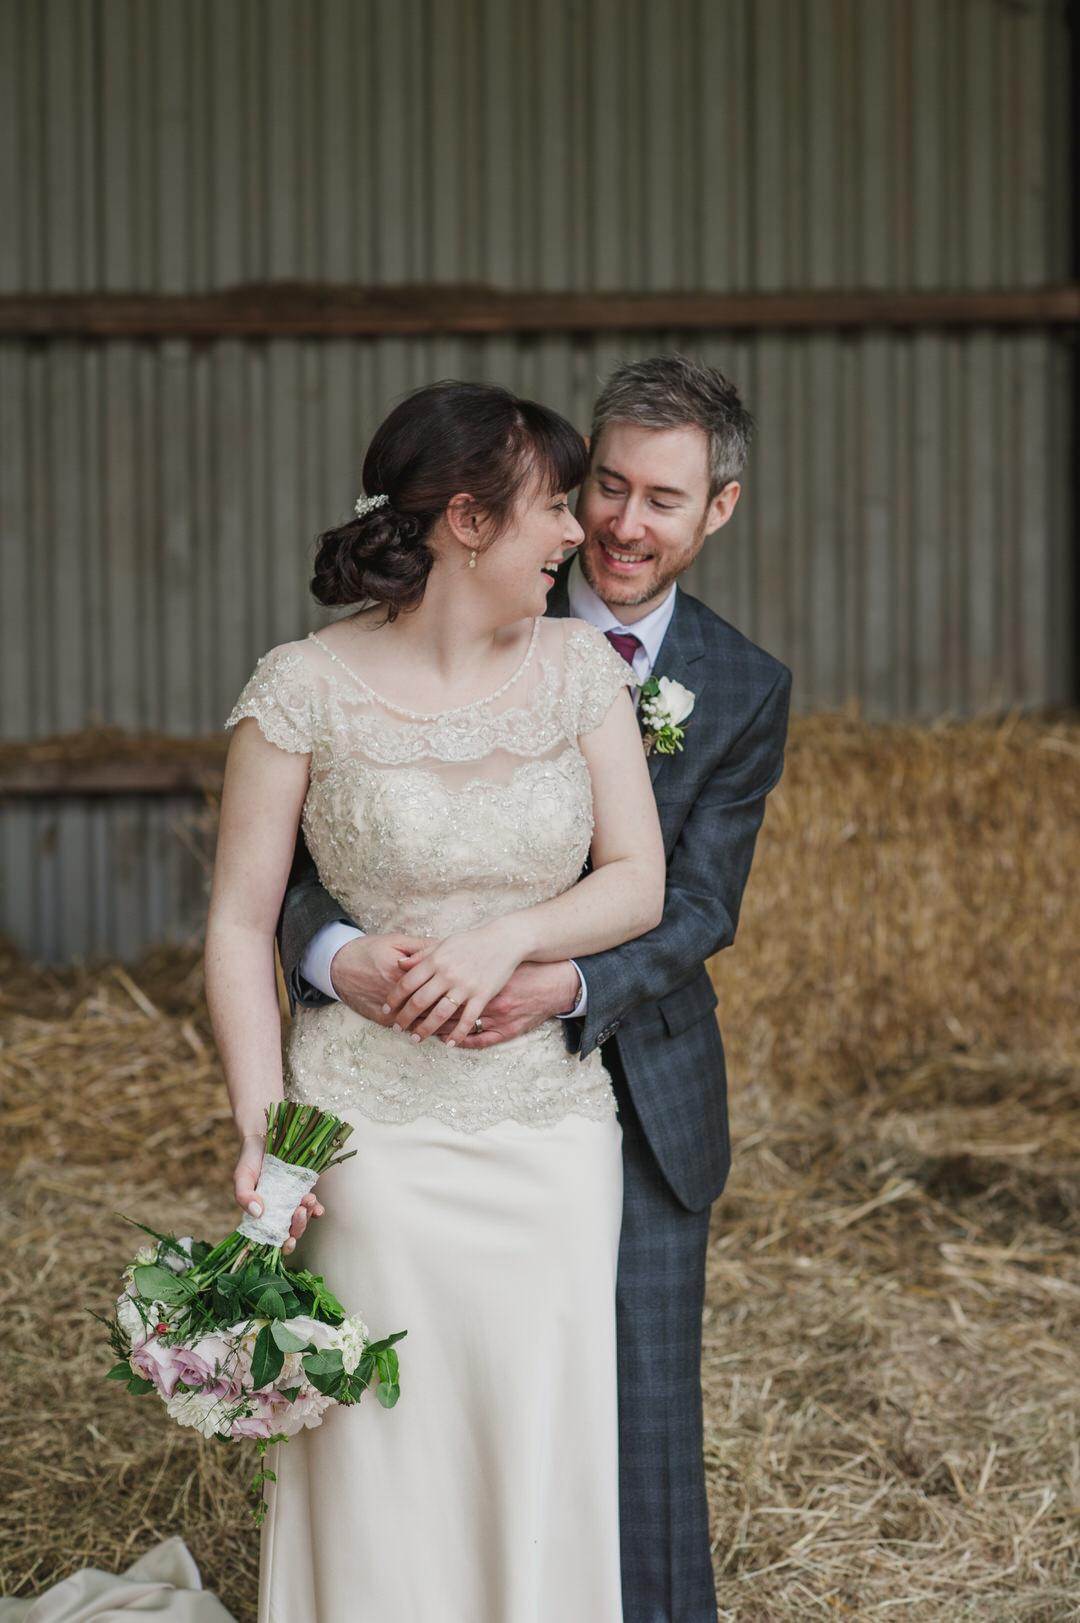 Karen-Flower-Herons-Farm-wedding-1109